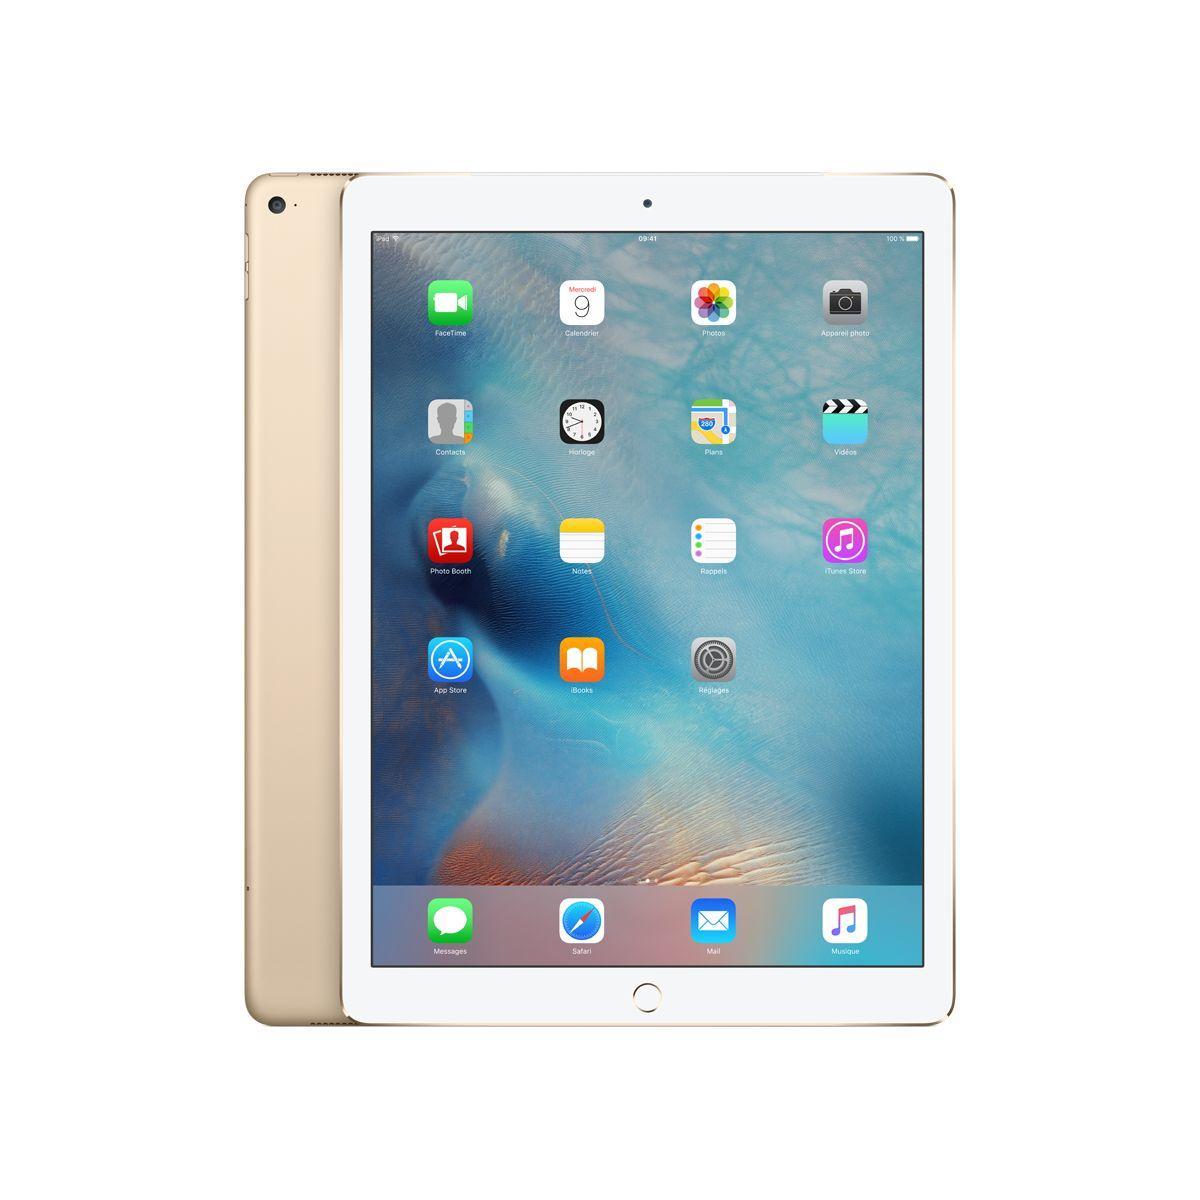 Apple ipad pro 12.9 cellular 256go gold (photo)